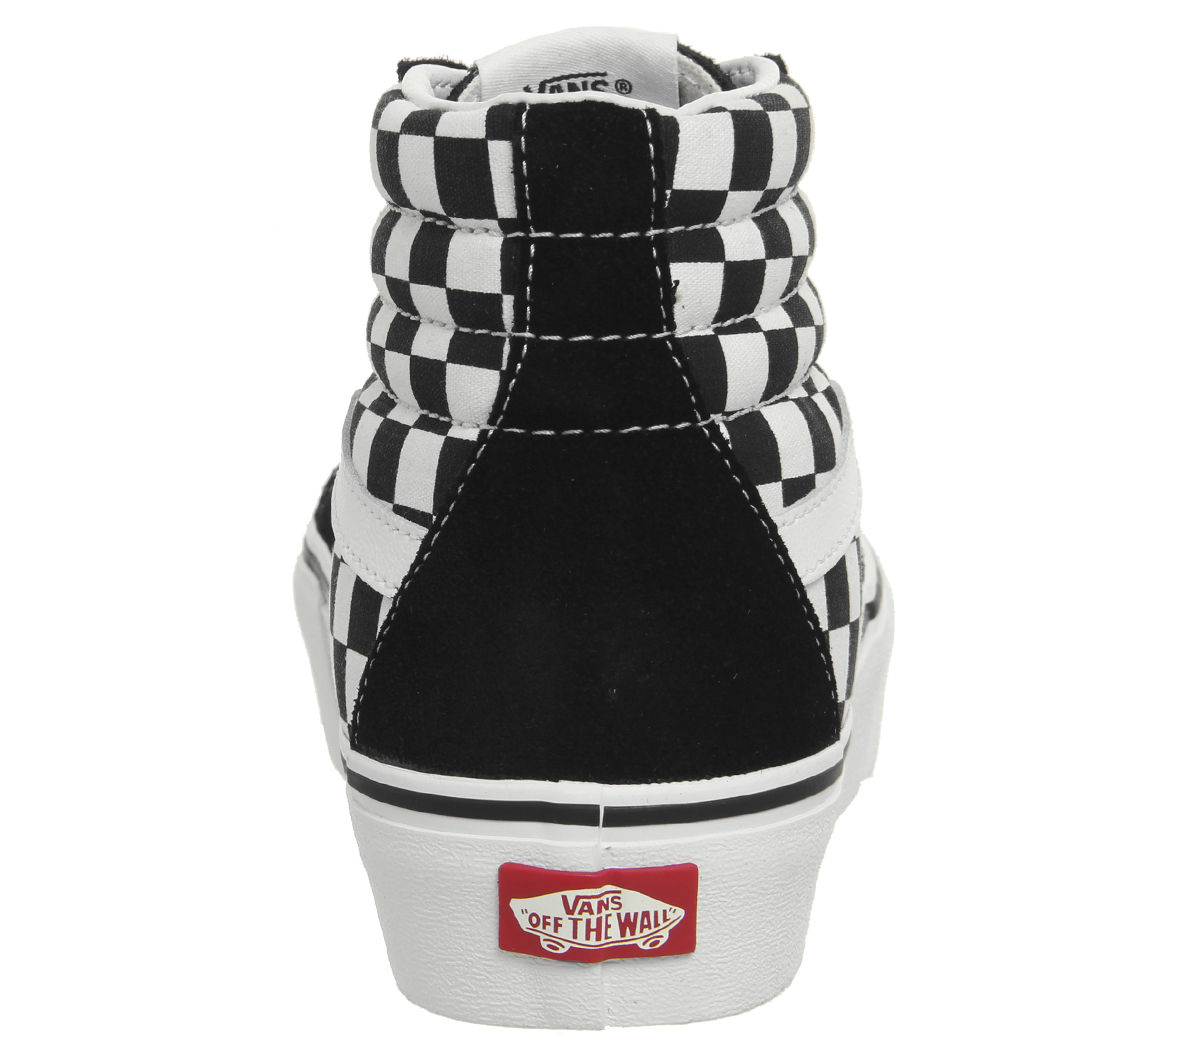 Womens Vans Sk8 Hi Platform 2.0 Trainers BLBCK WHITE CHECKERBOBRD Trainers Shoes